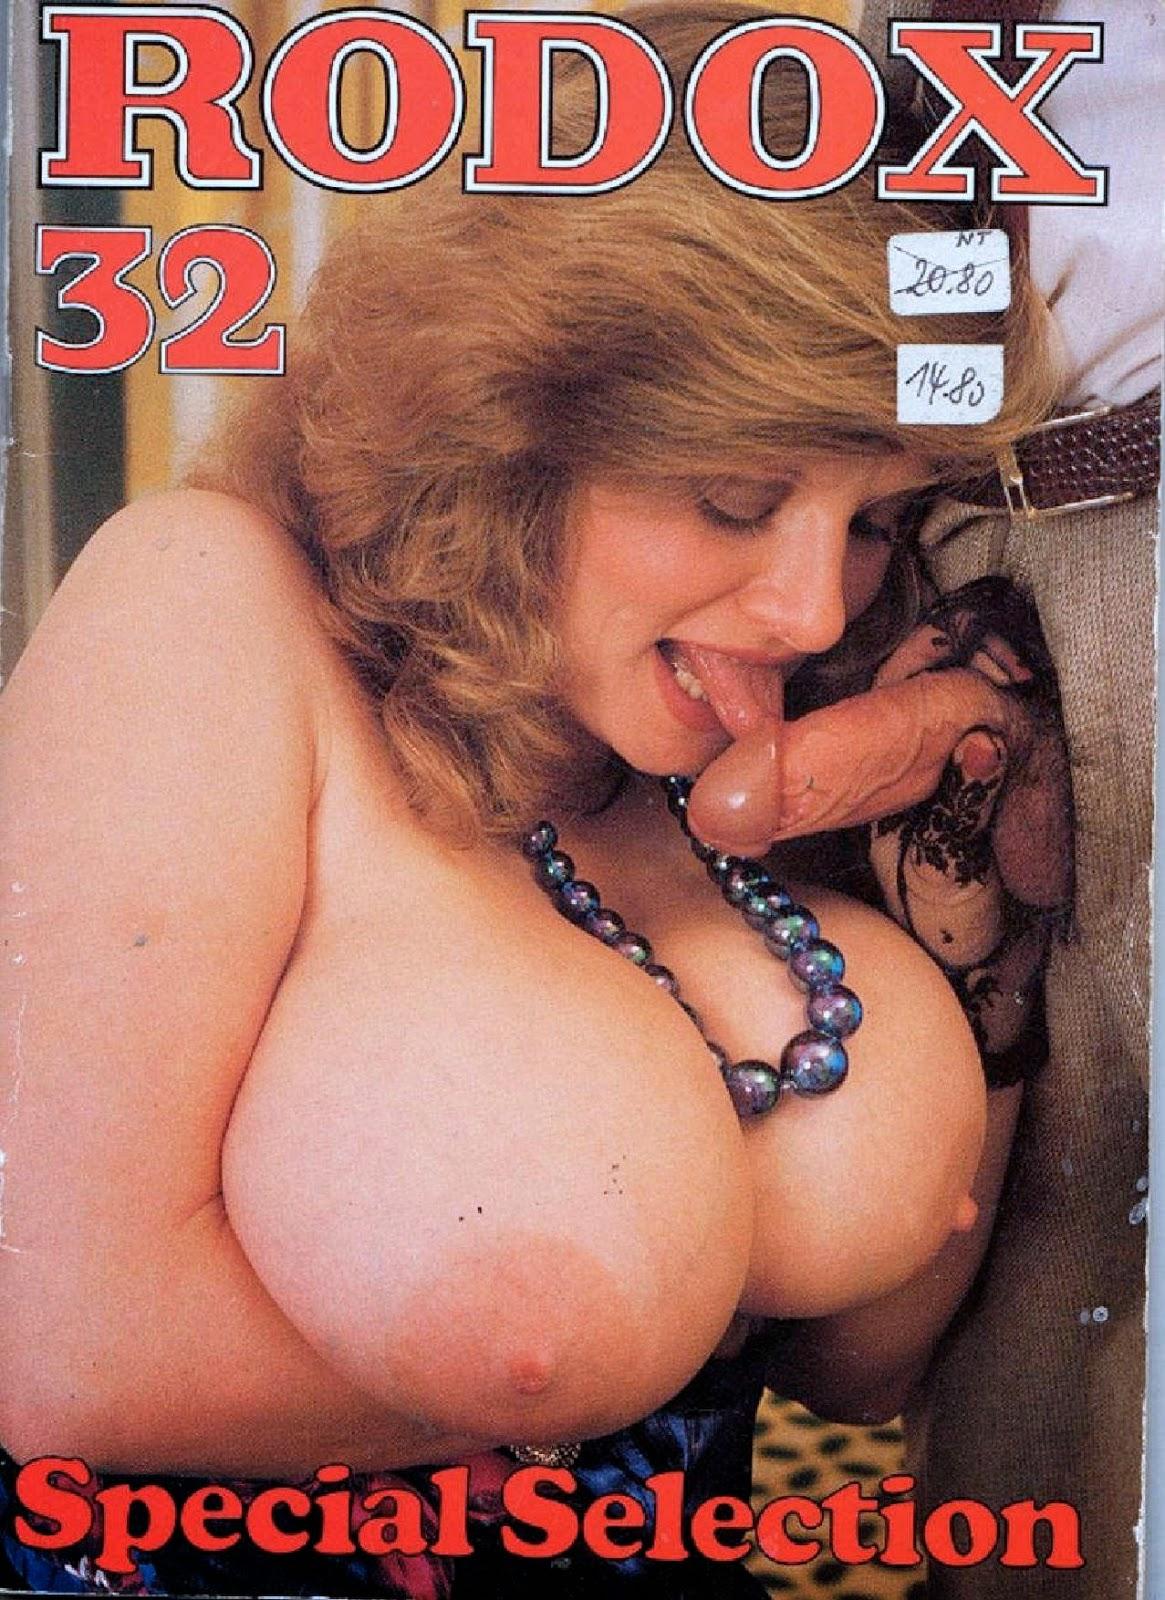 was ist ein gangbang erotik magazin